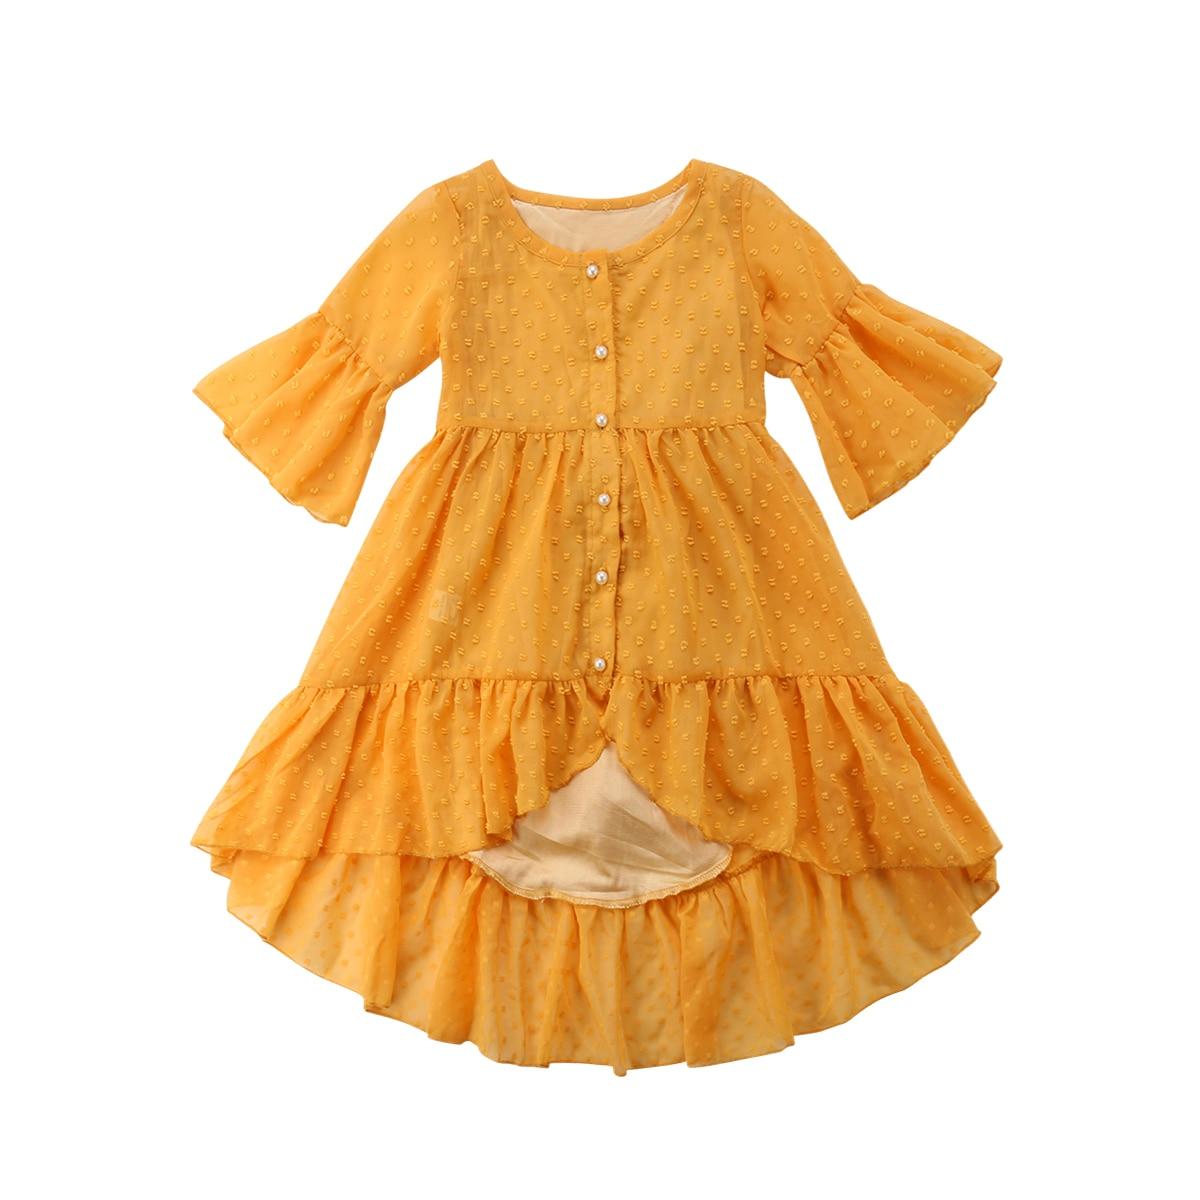 Pudcoco, 1-6T, bebé encantador, flor, niña, Princesa, bebé, niña, vestidos largos, bohemio, volantes, fiesta, graduación, Playa